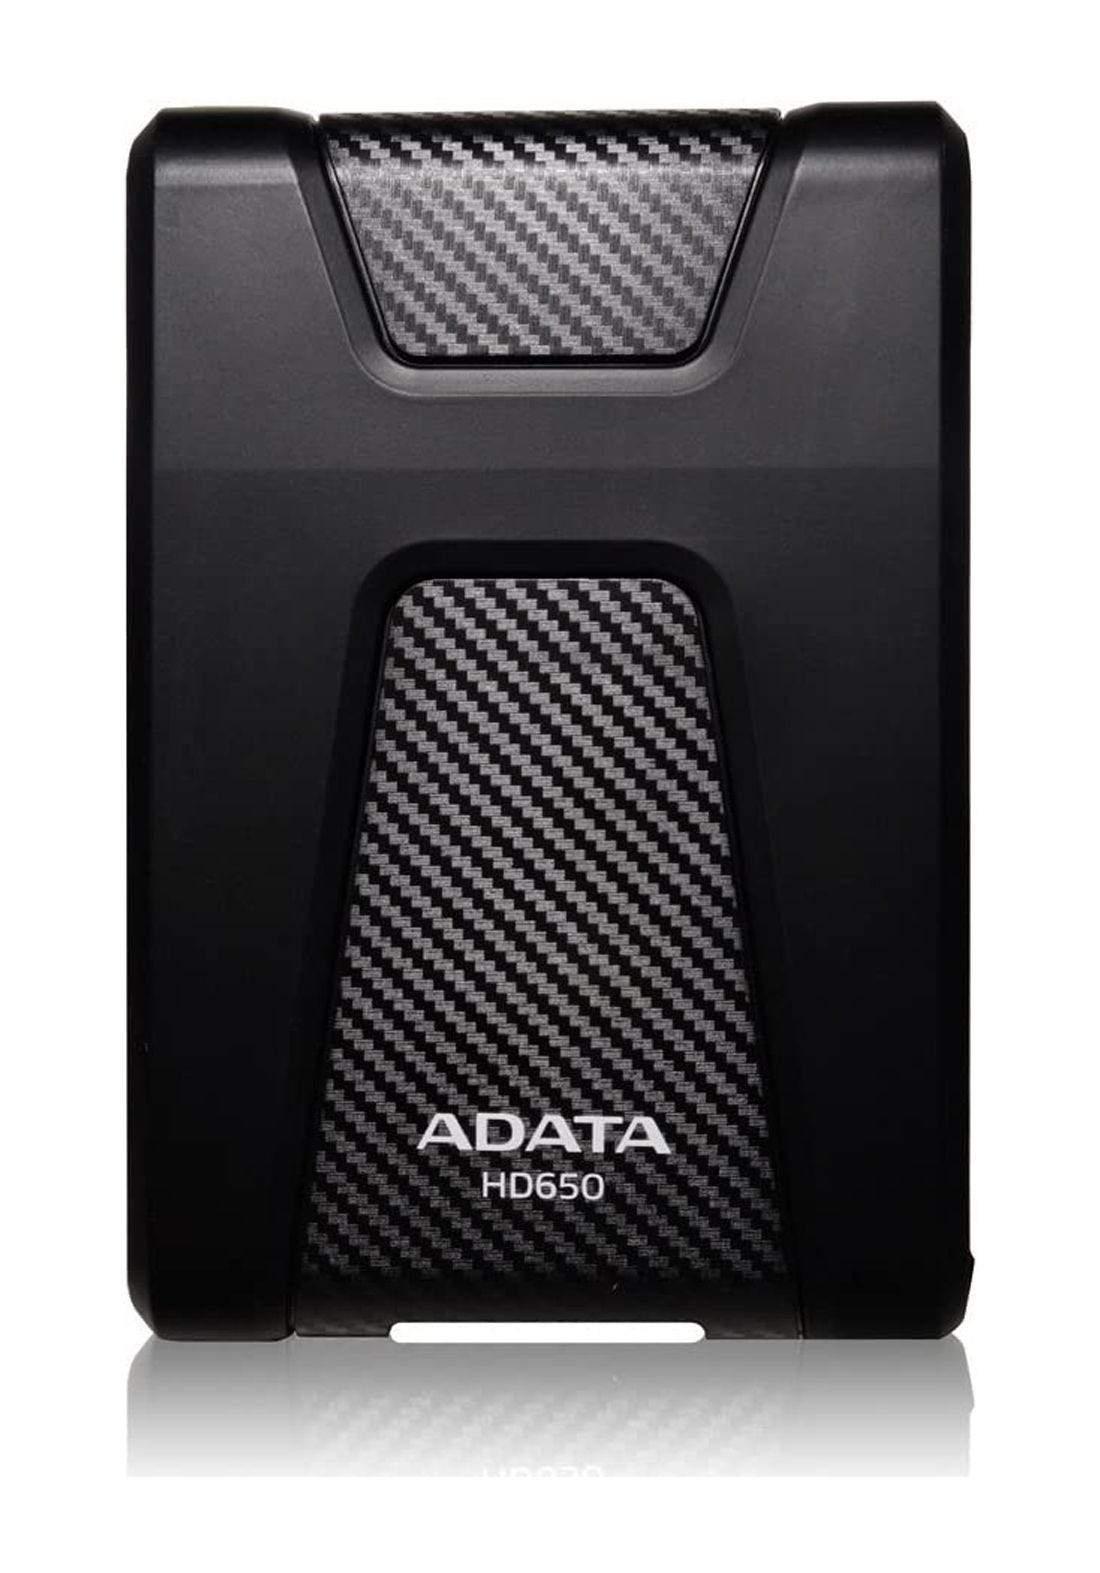 Adata HD330 2TB USB 3.1 Portable External Hard Drive - Black هارد خارجي